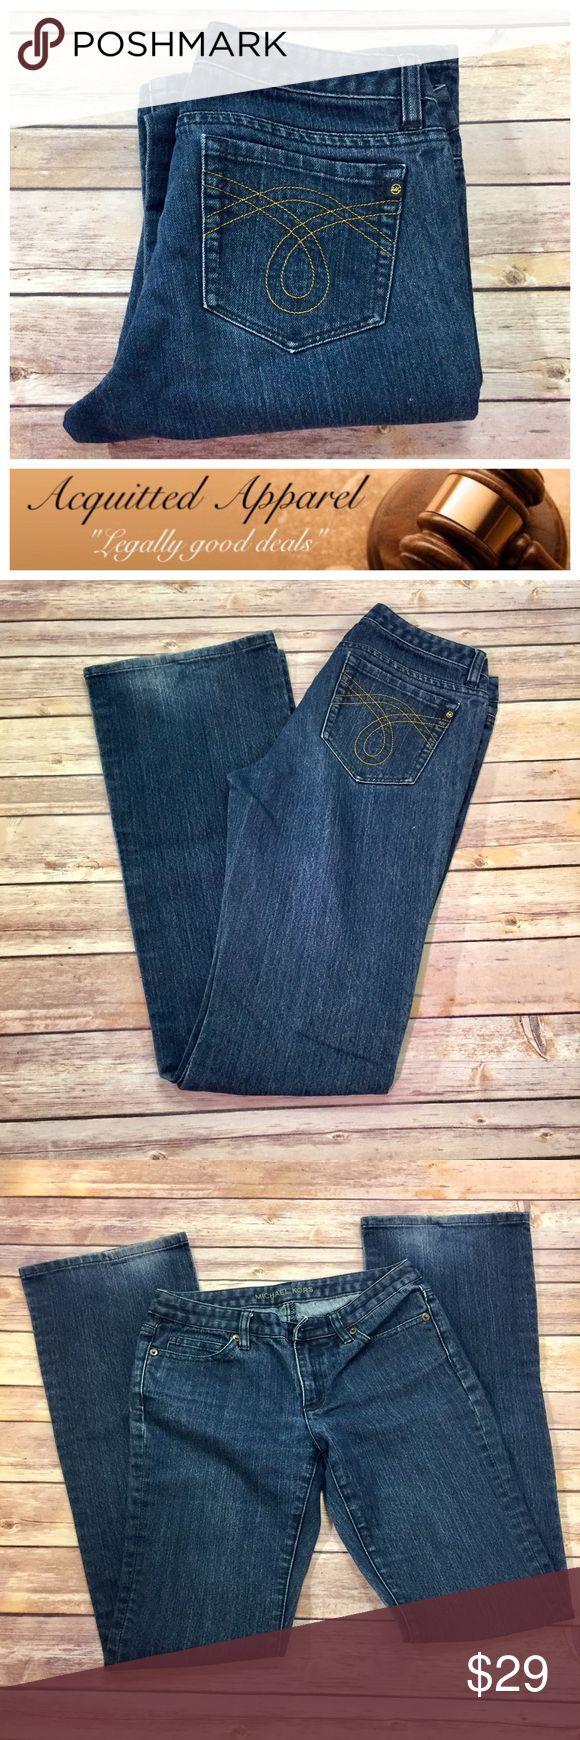 [Michael Kors] Flare Leg Jeans Size 0 Beautiful flare leg jeans. Michael kors size 0. Michael Kors Jeans Flare & Wide Leg